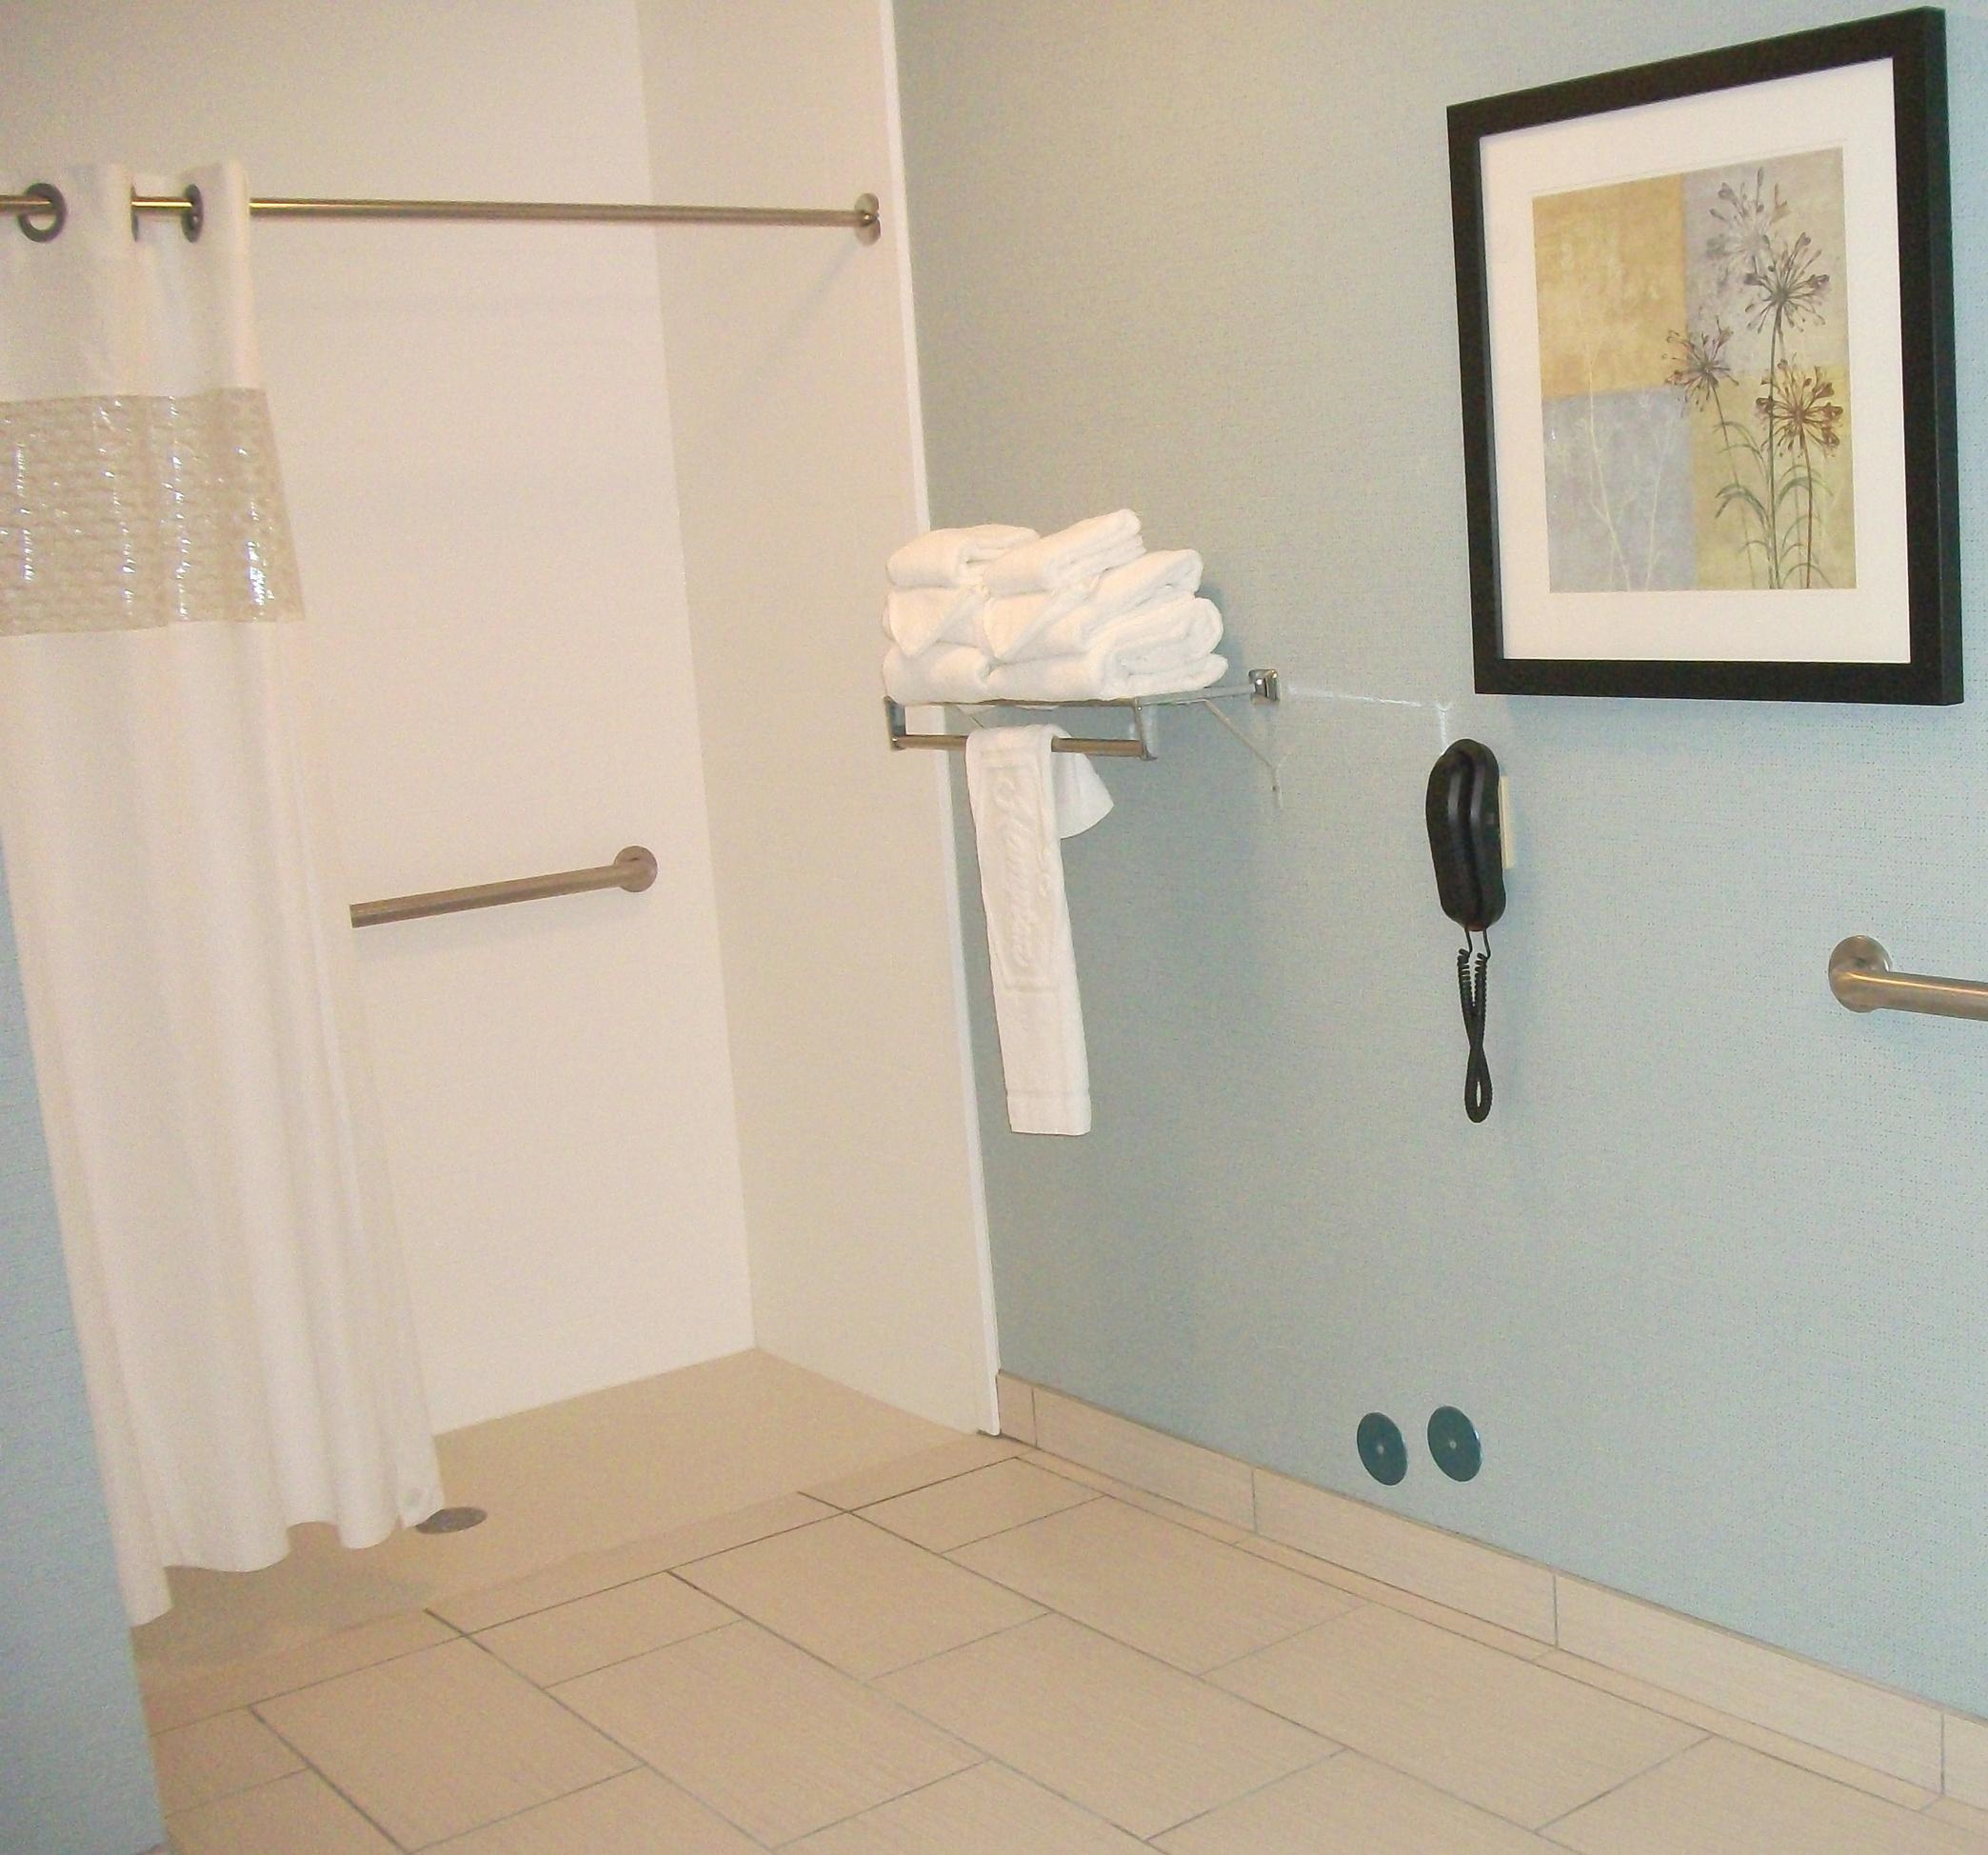 Hampton Inn & Suites Manteca image 17